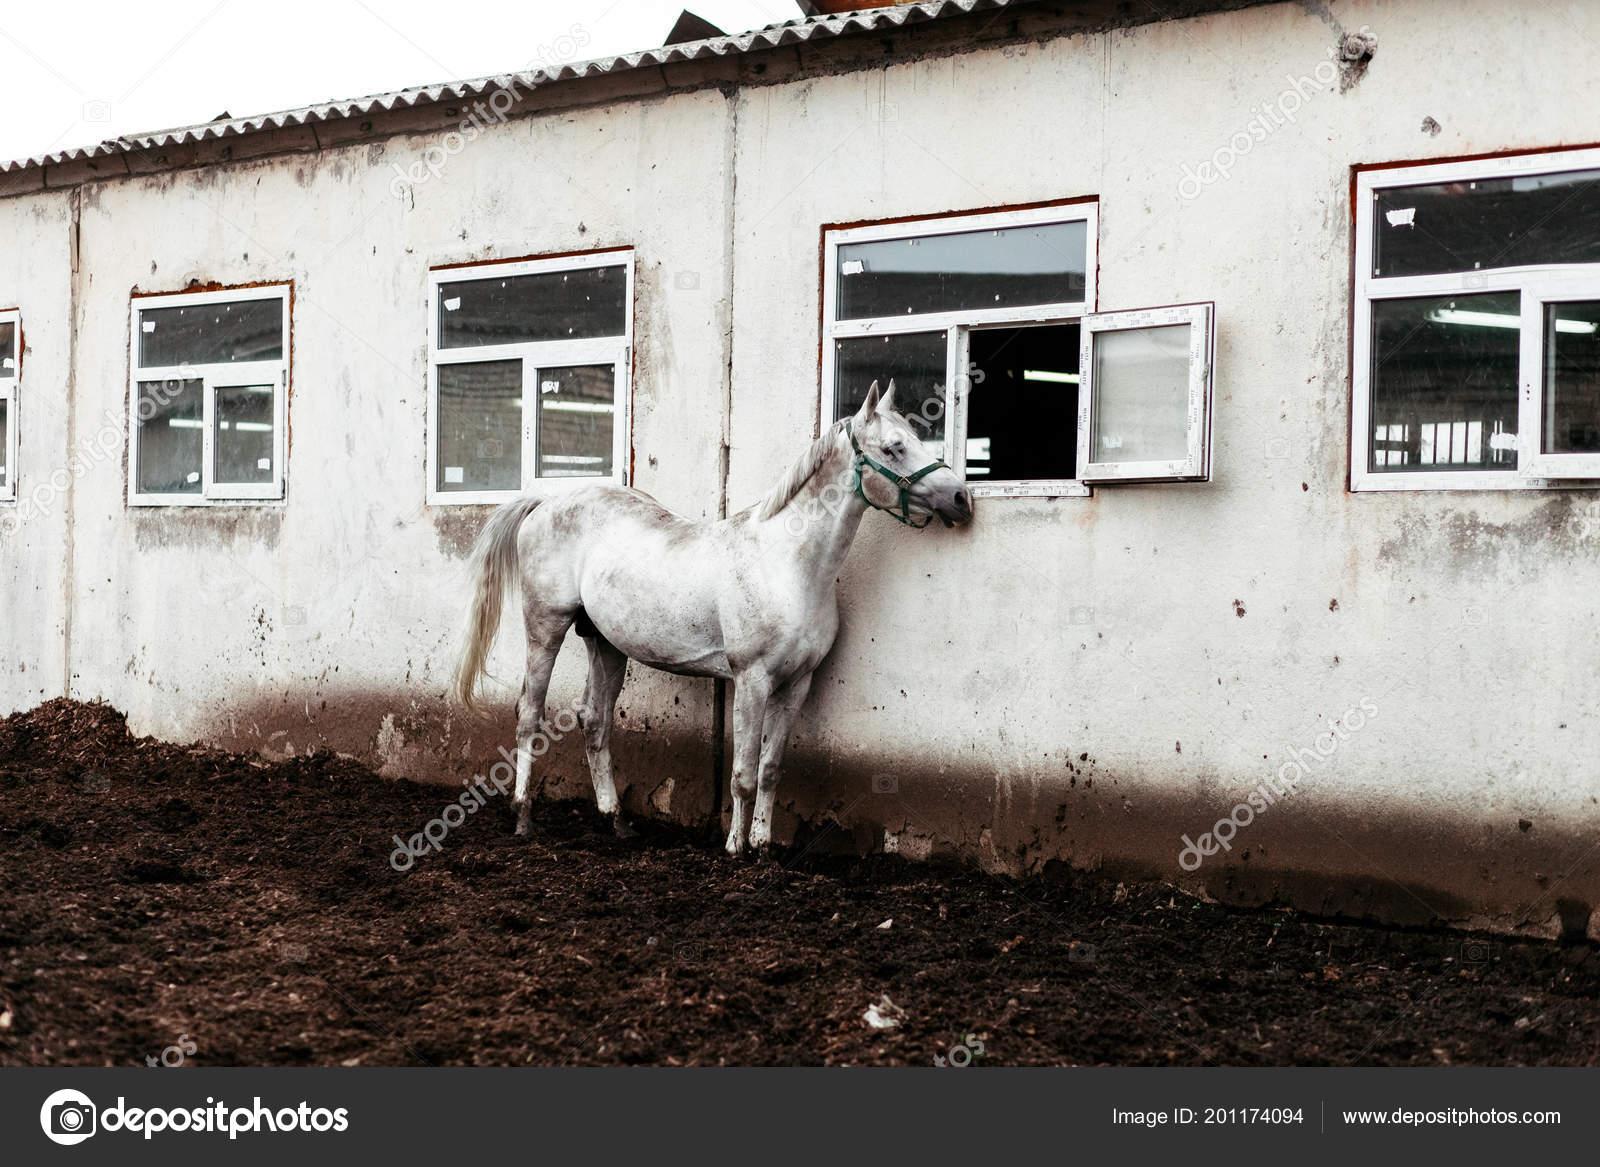 Beautiful Horses Animals Pasture Stables Horseback Riding Stock Photo C Vitizh 201174094